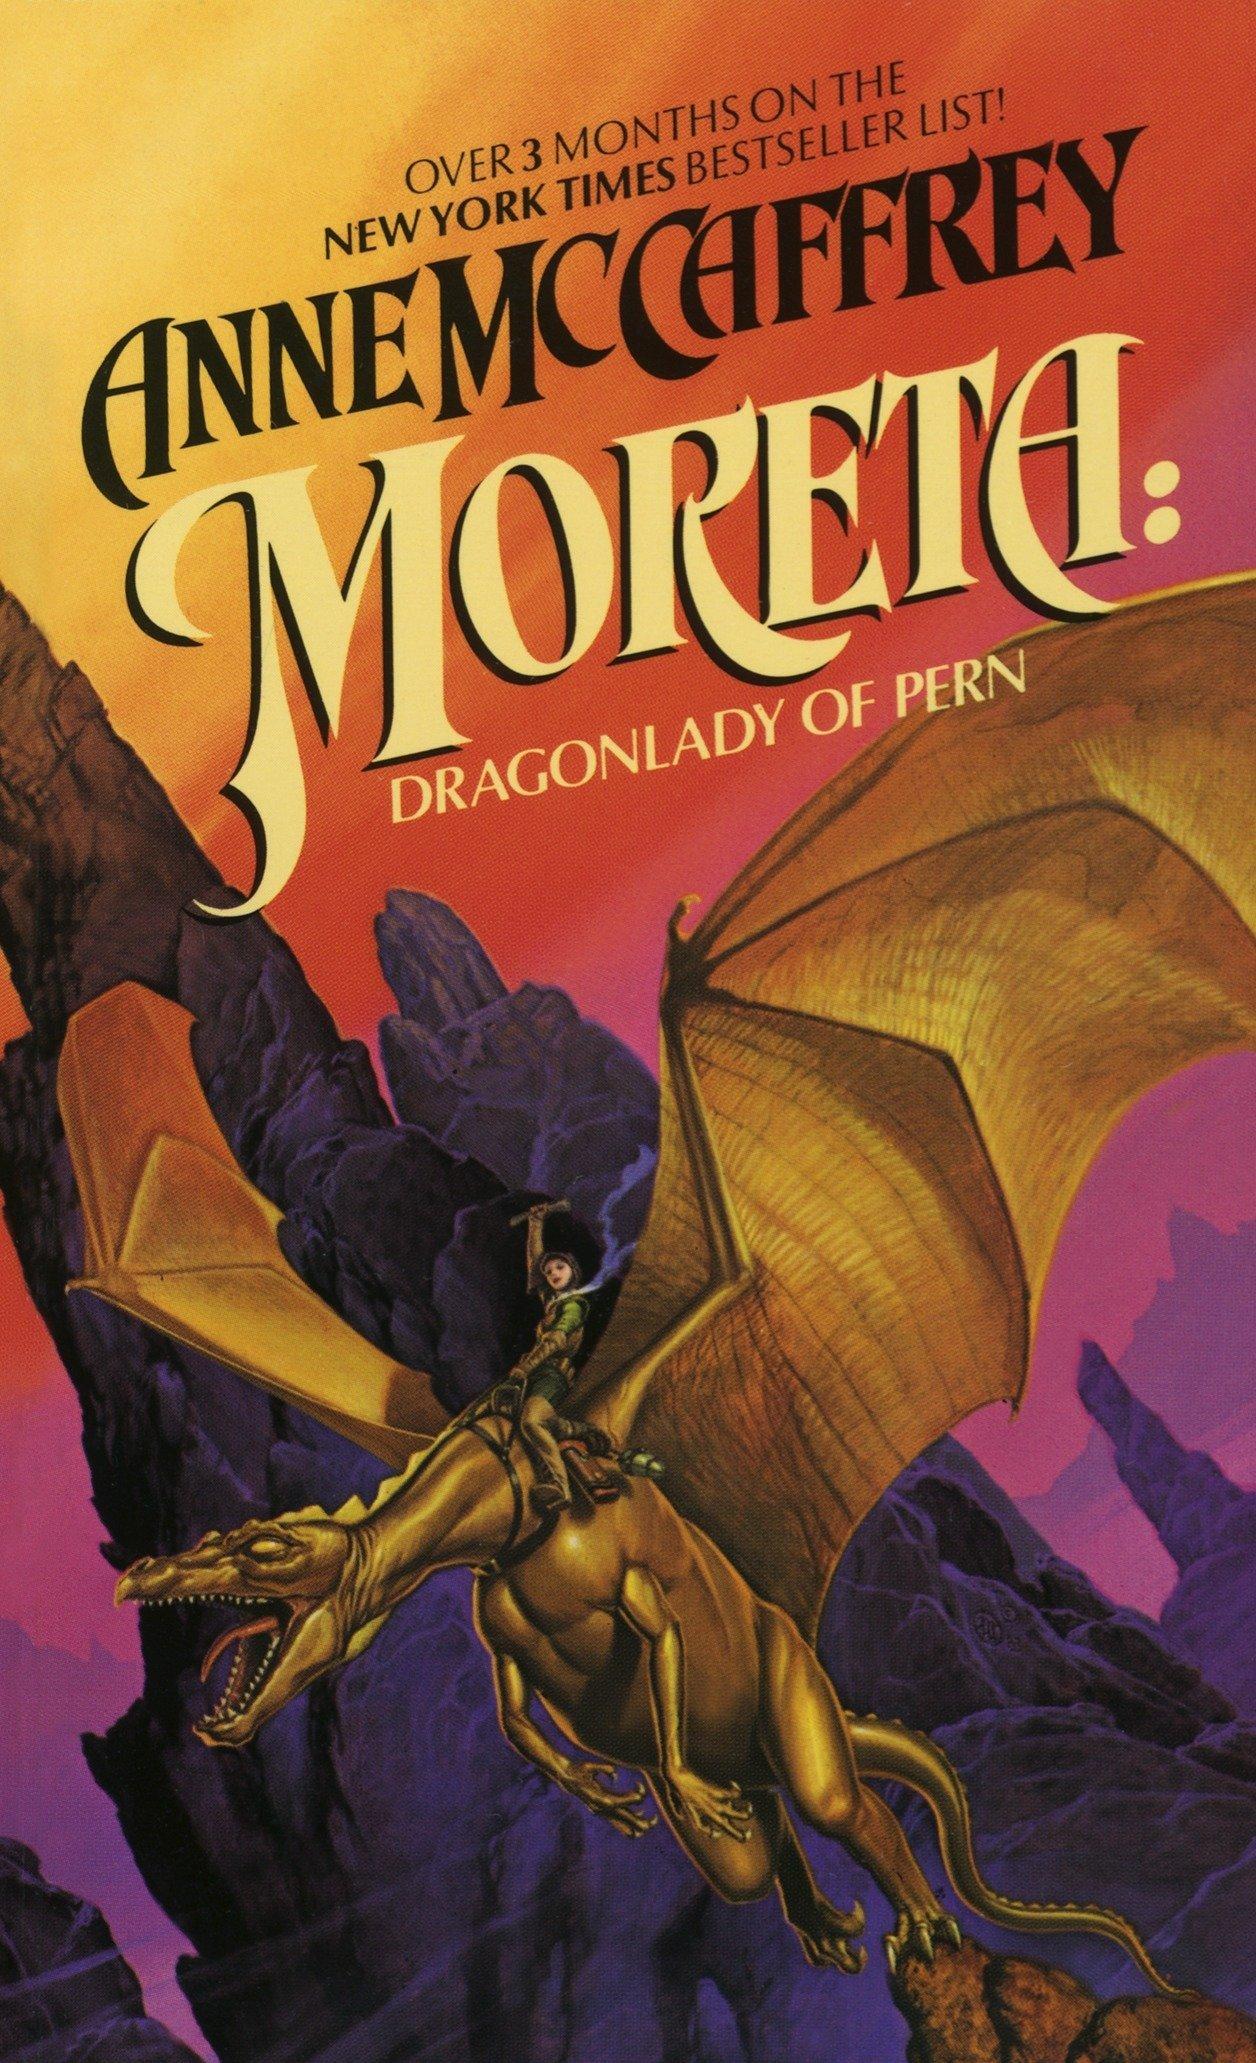 Moreta: Dragonlady of Pern: Anne McCaffrey, Michael Whelan: 9780345298737:  Amazon.com: Books